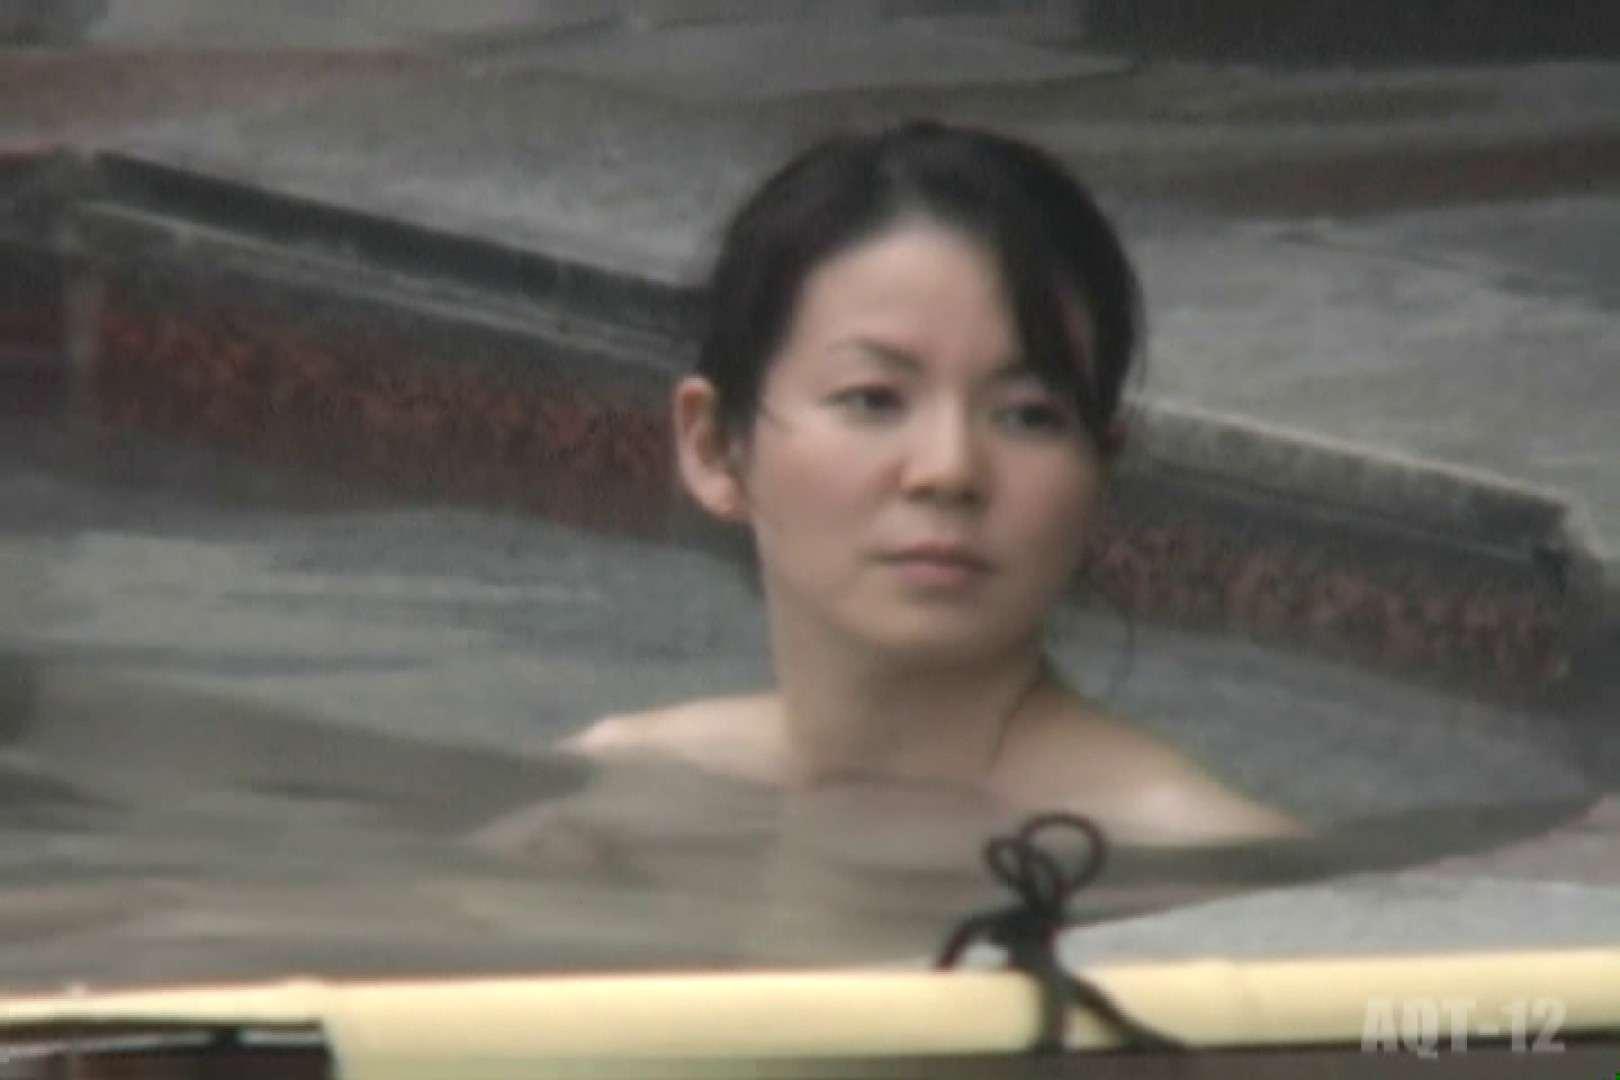 Aquaな露天風呂Vol.811 0  38連発 30